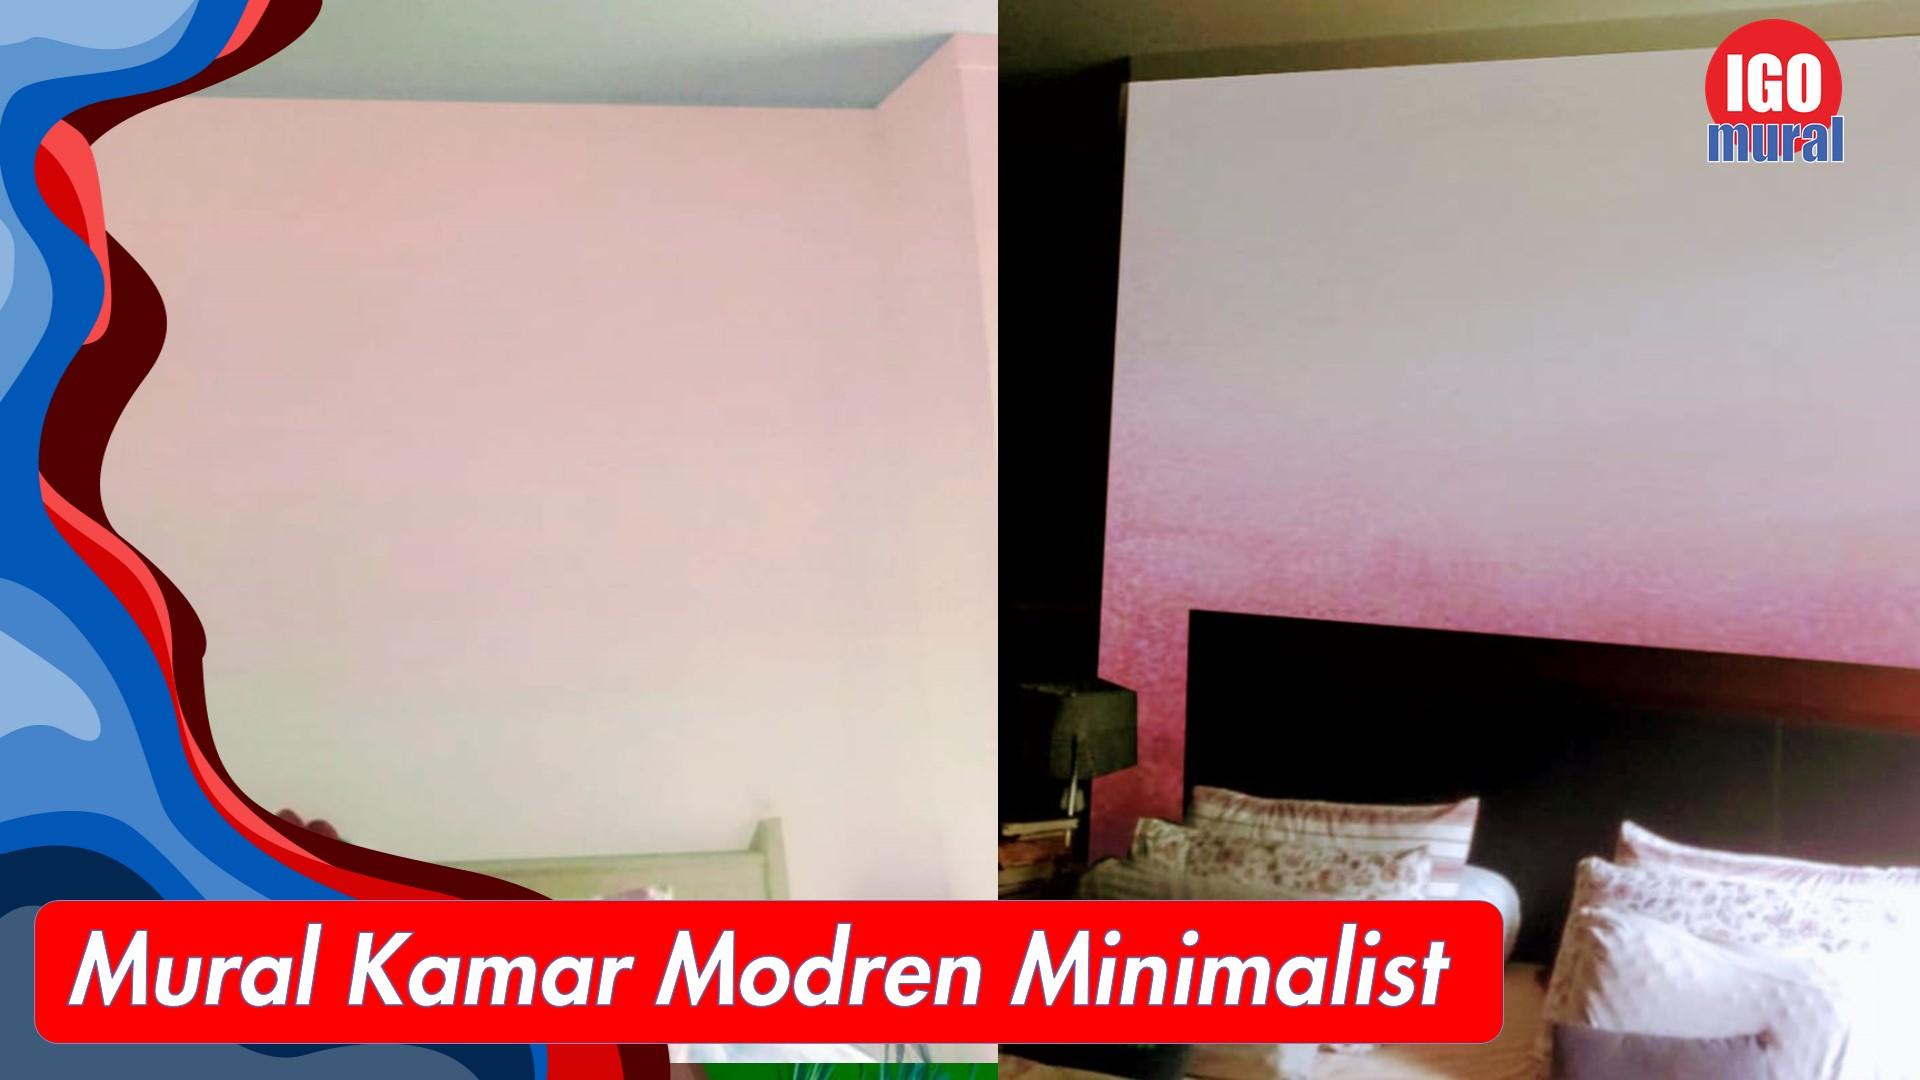 mural kamar modern minimalis